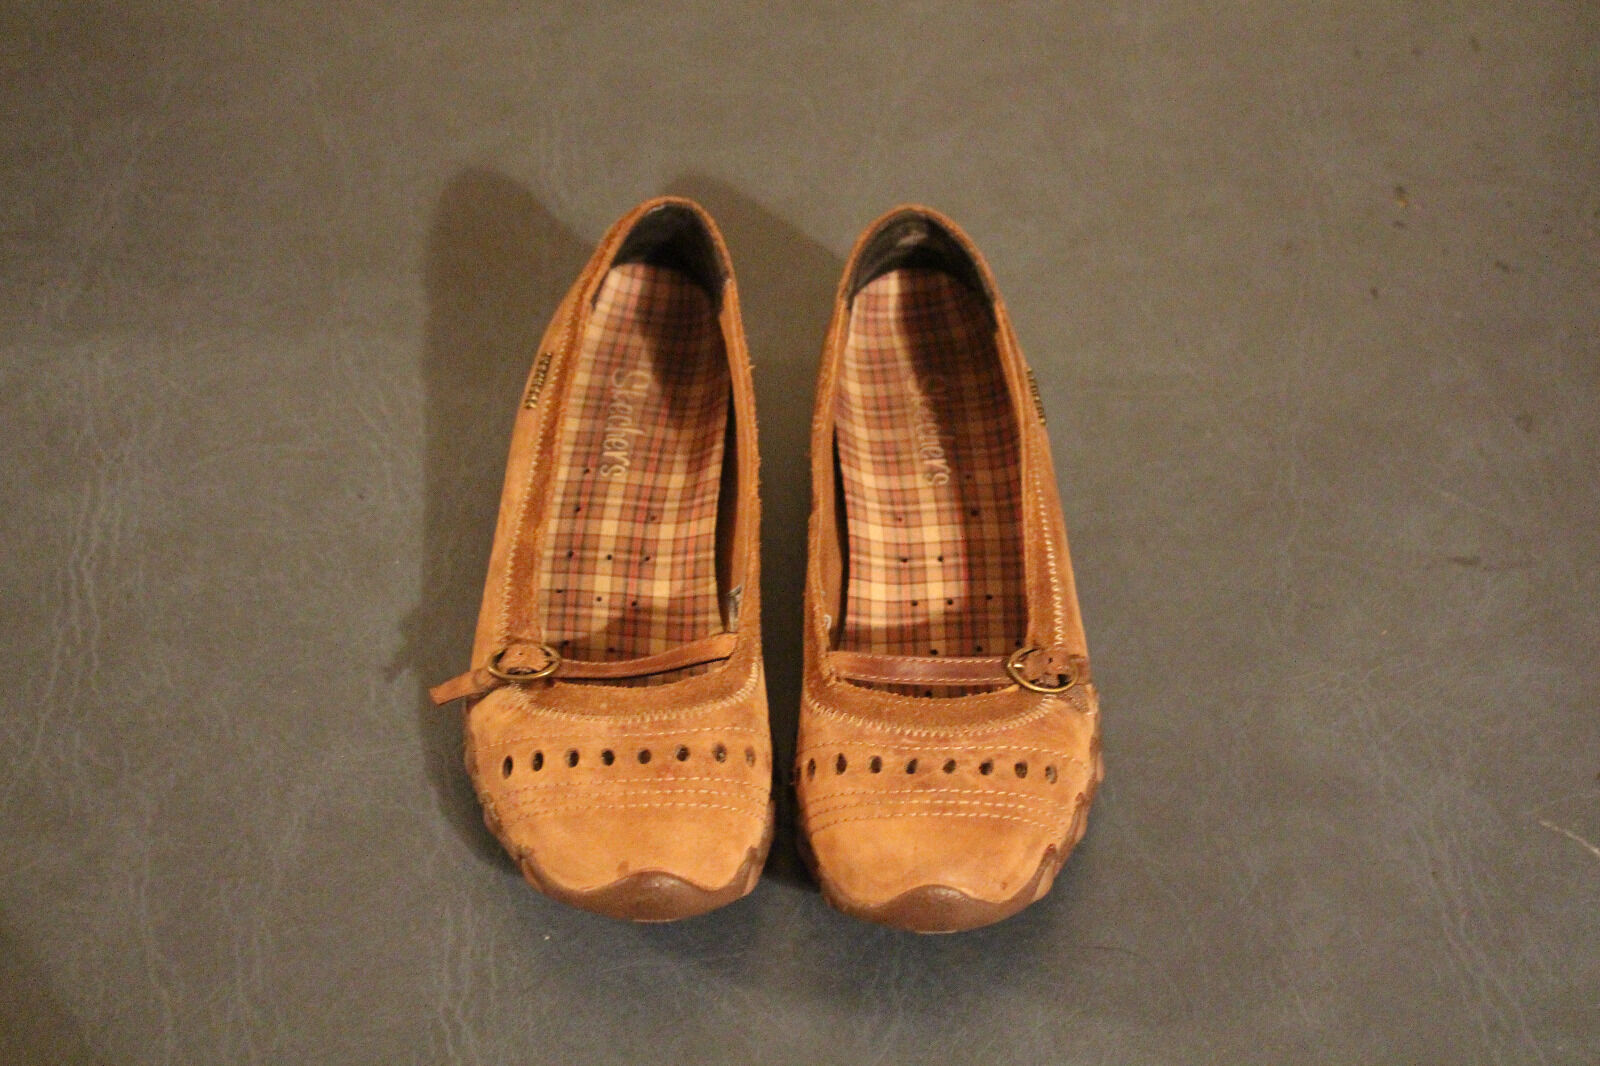 Skechers Brown Nubuck Suede Ballet Style Flats Women size 6.5